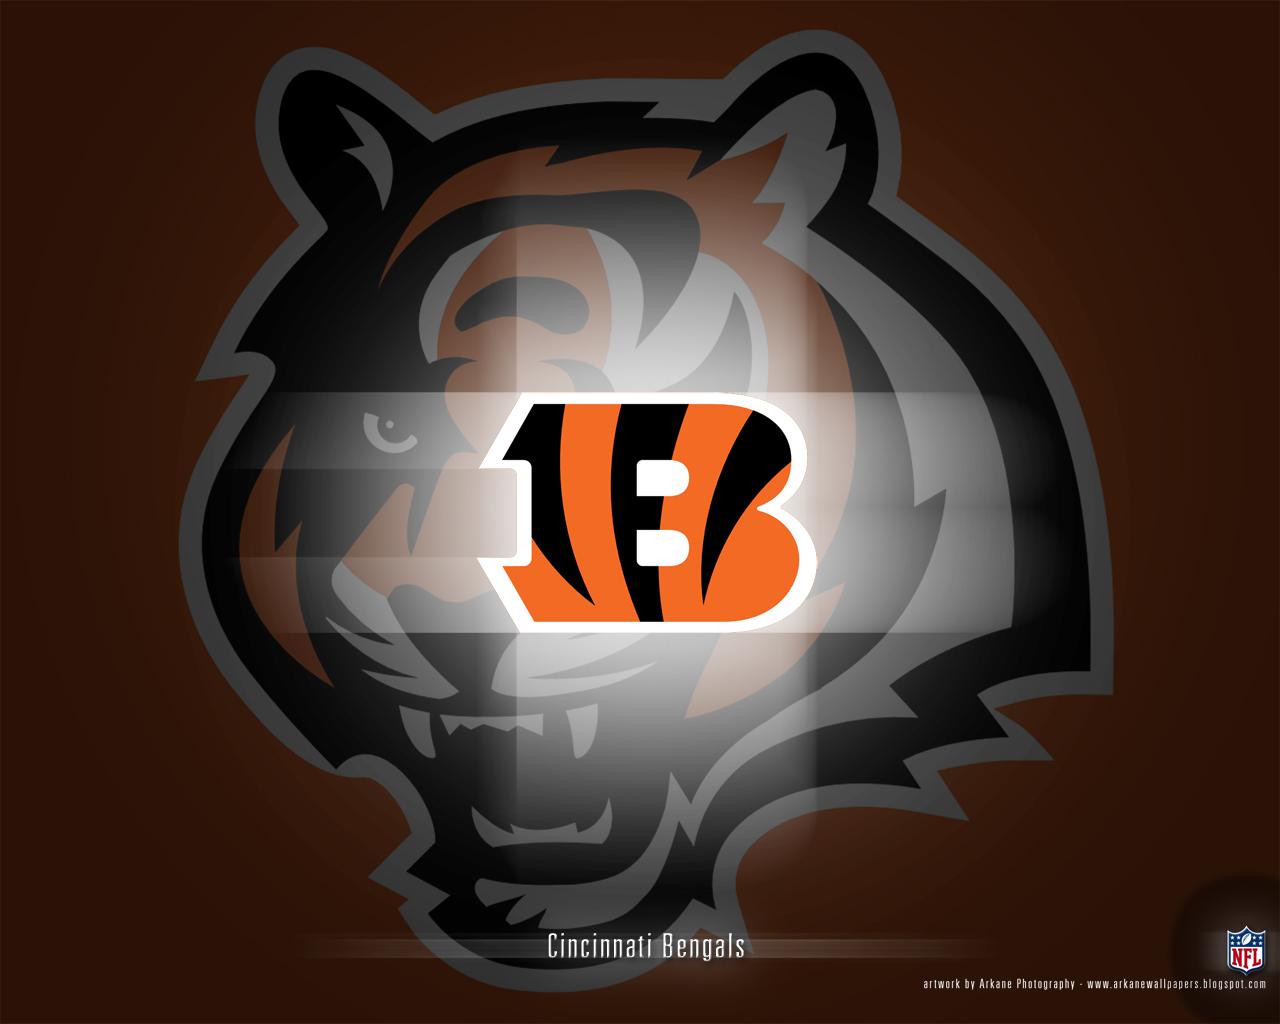 49+] Cincinnati Bengals Wallpaper and